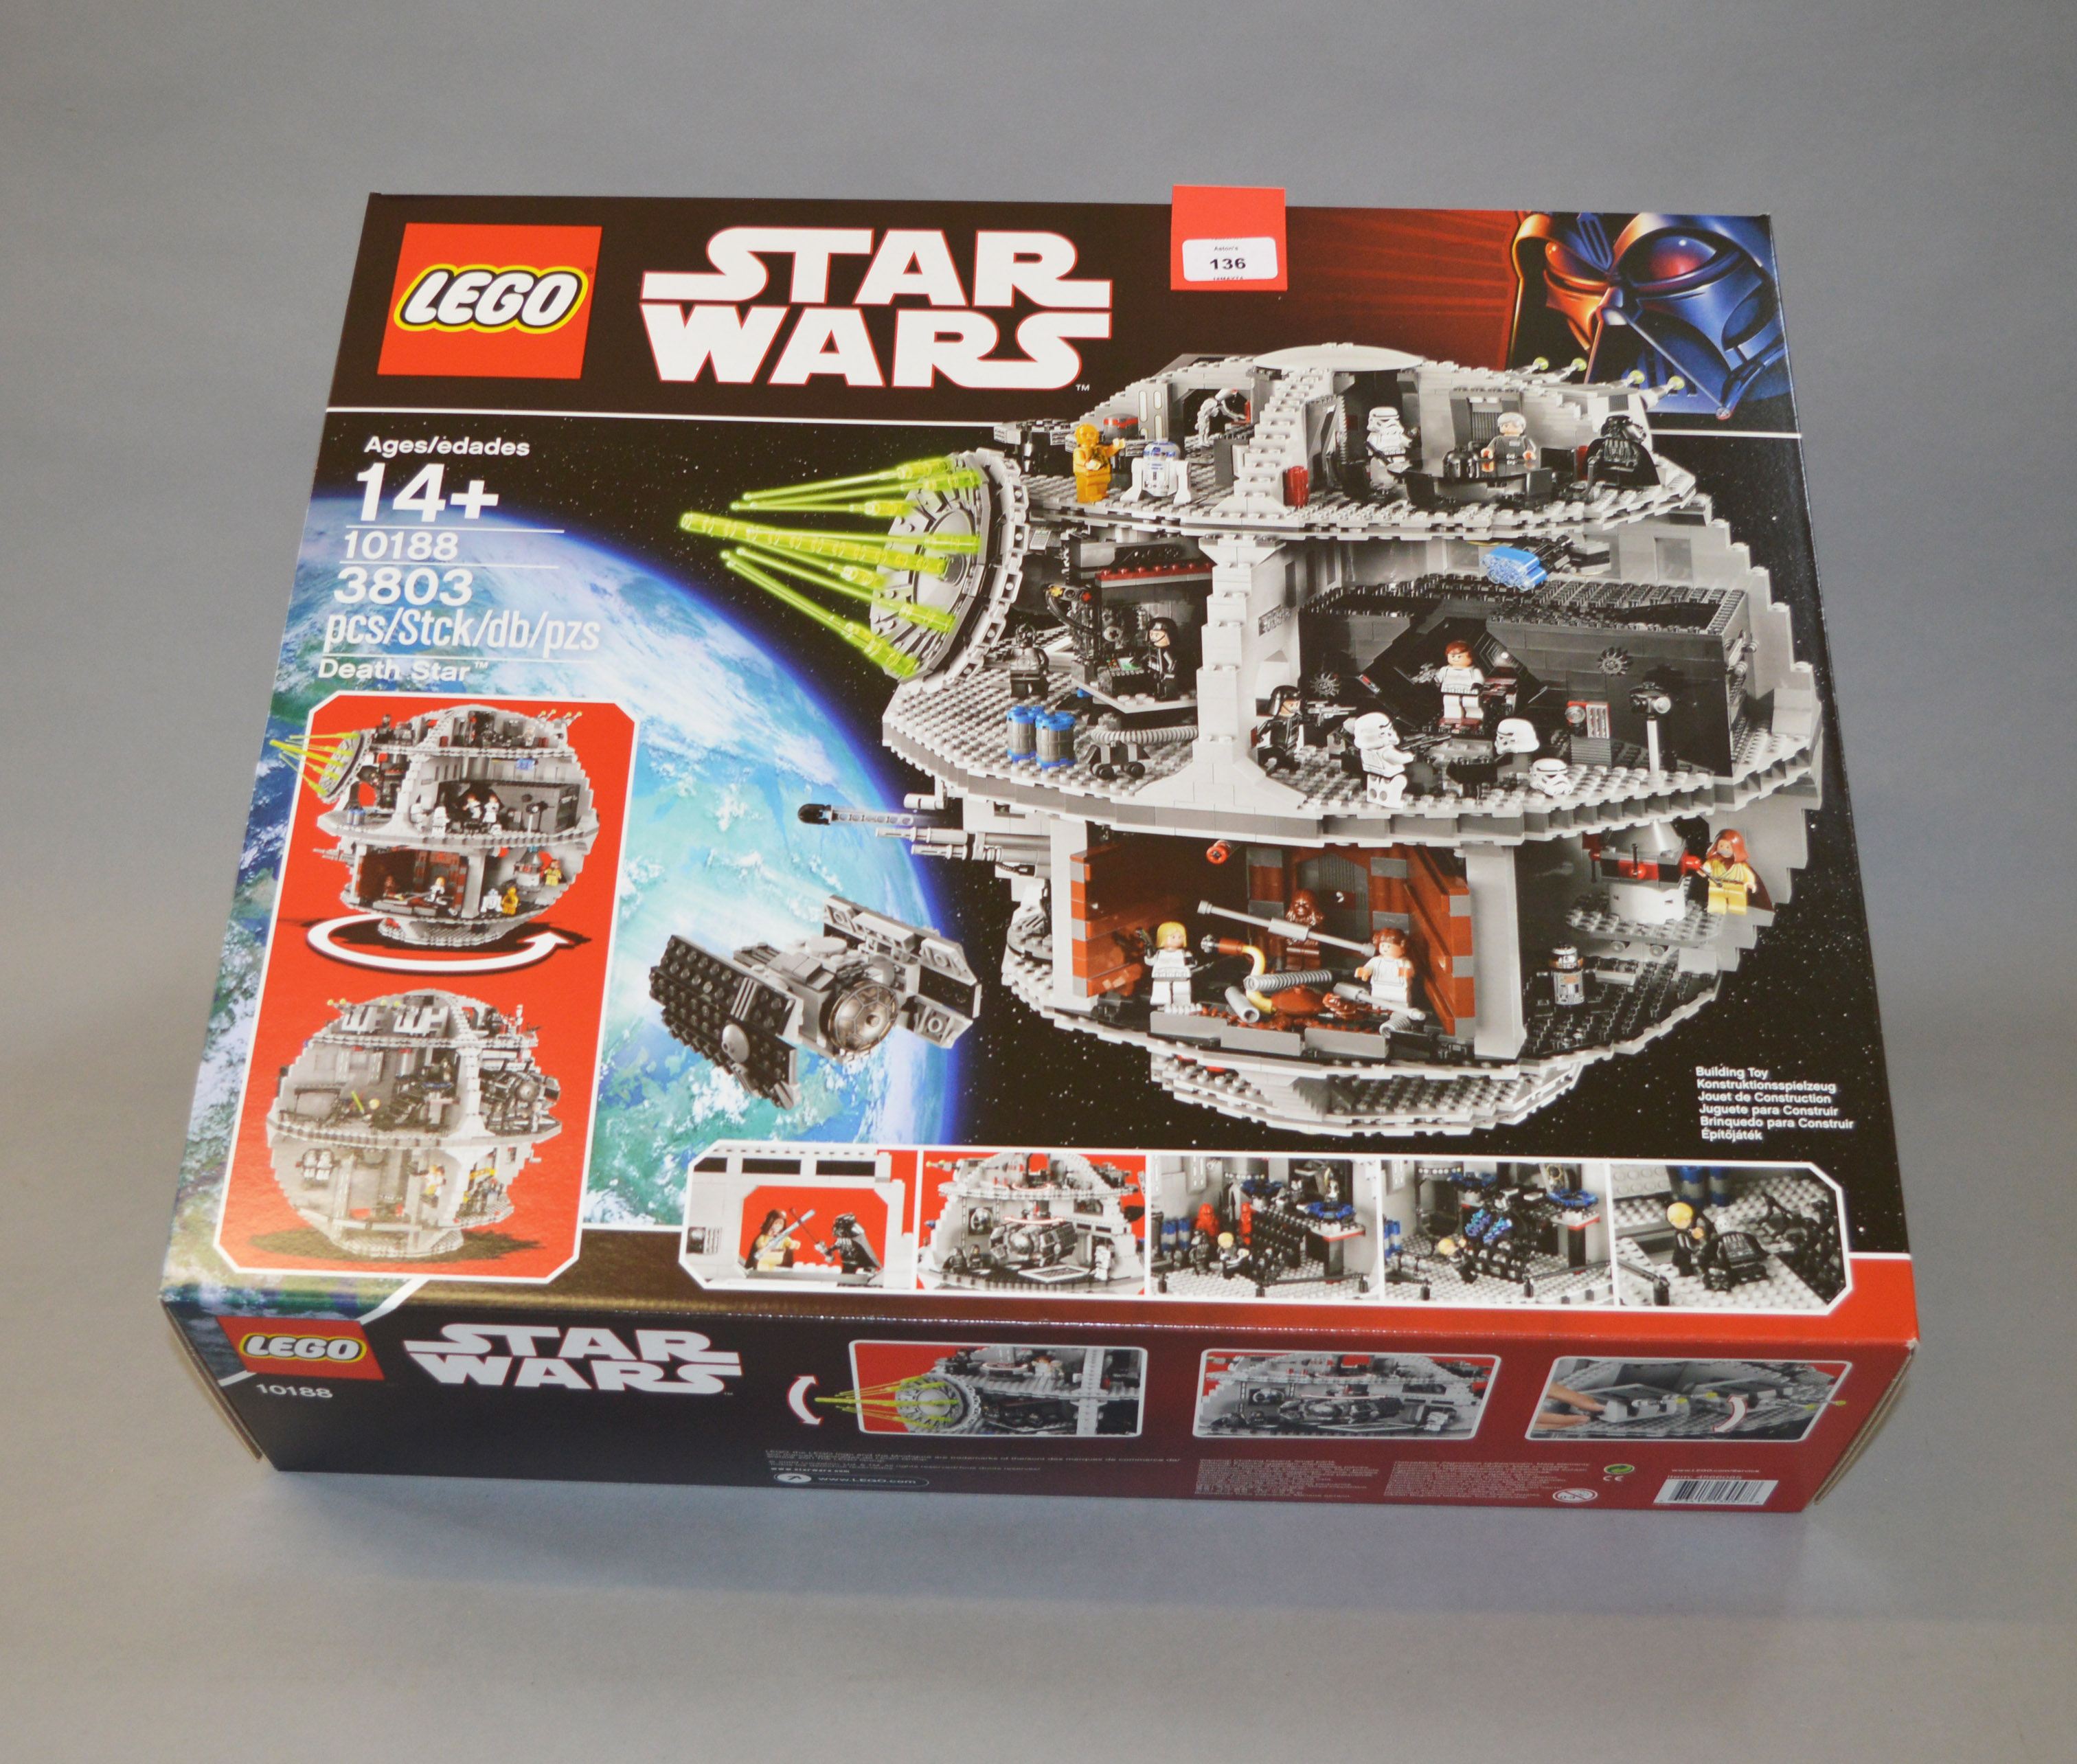 Lego Star Wars 10188 Death Star Unopened In E Box